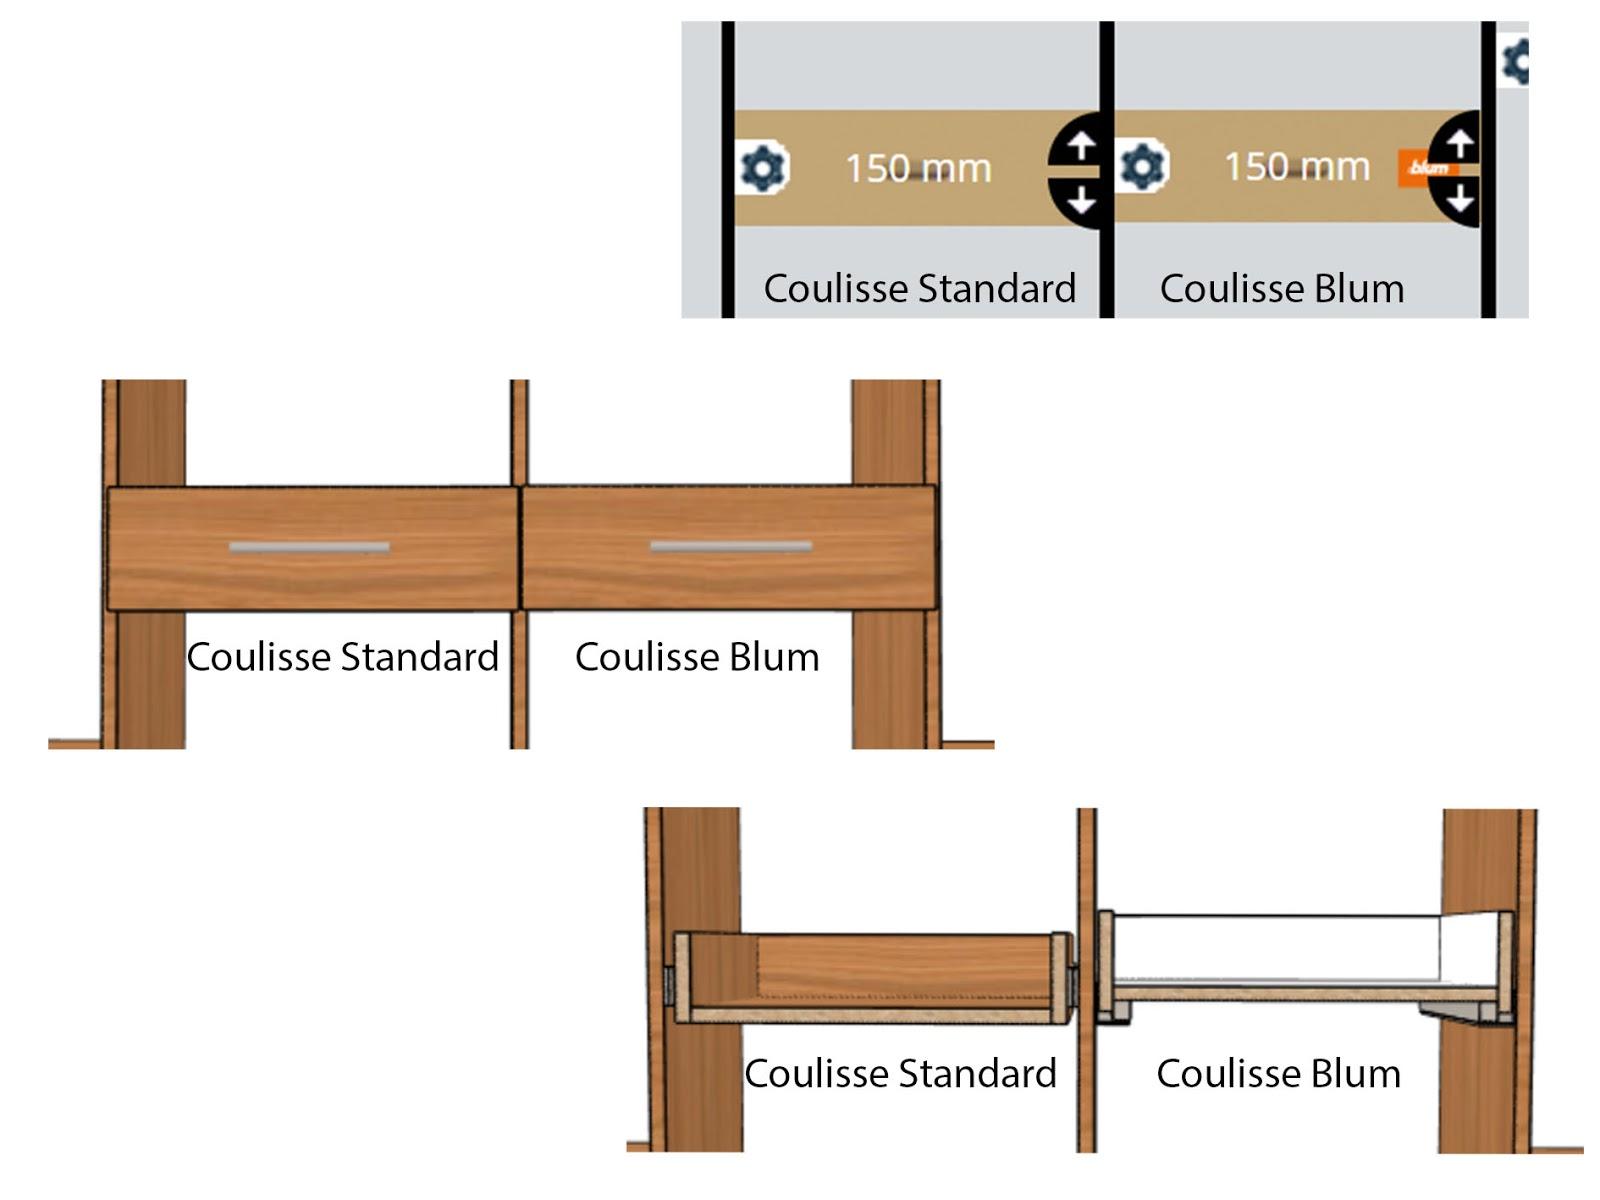 comparatif position tiroir coulisse tandem blum coulisse bille standard